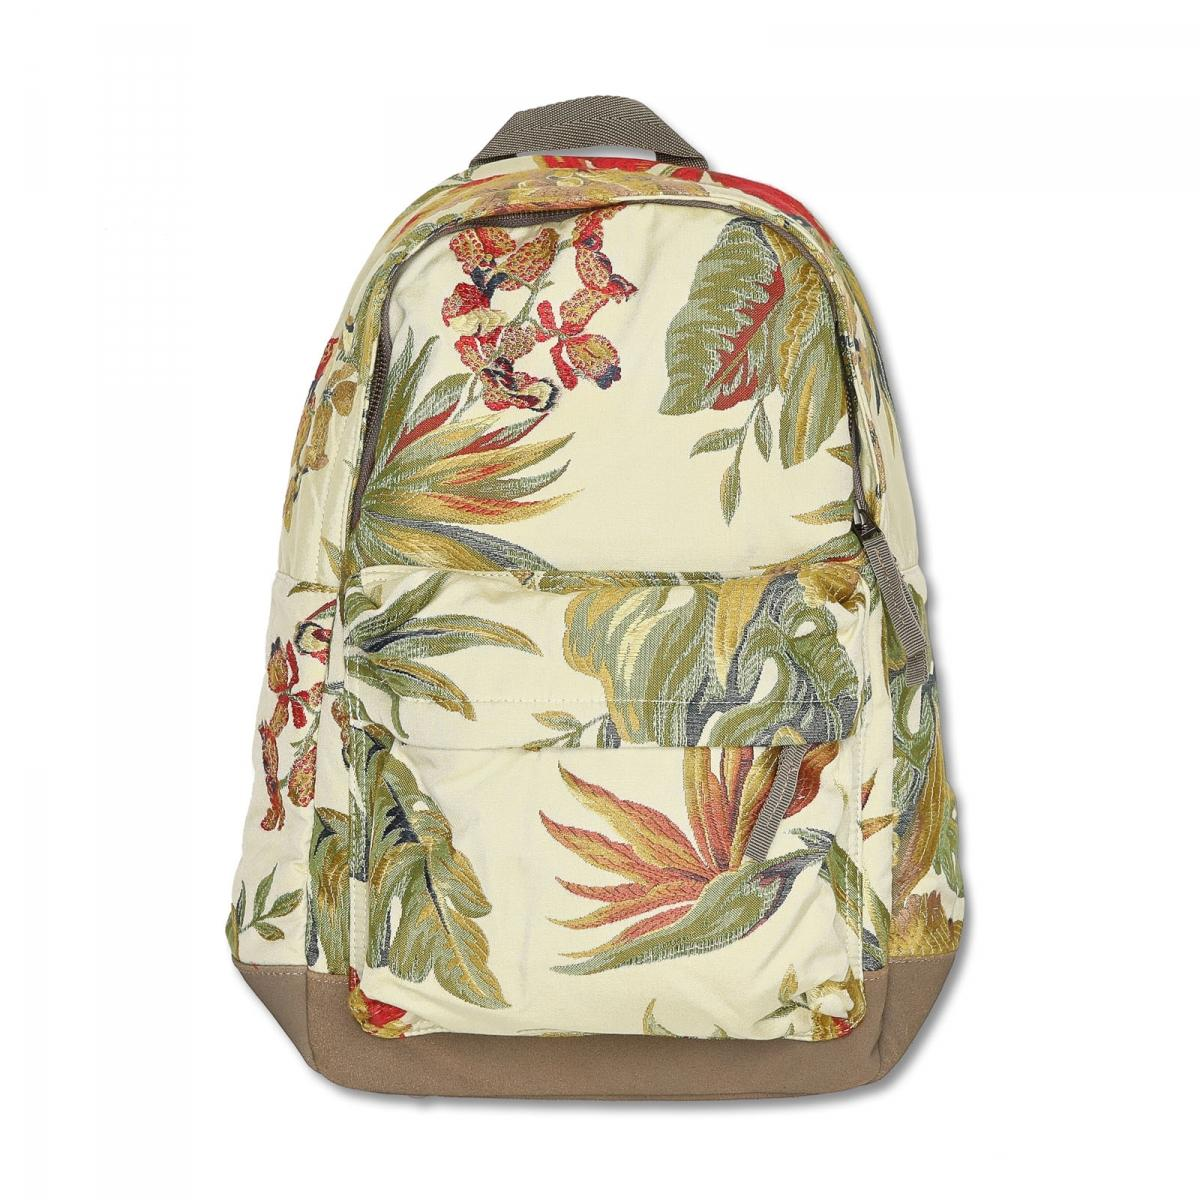 Adidas Originals Pharrell Williams  jacquard Pack 2.0  Backpack in ... 3543b69e7c